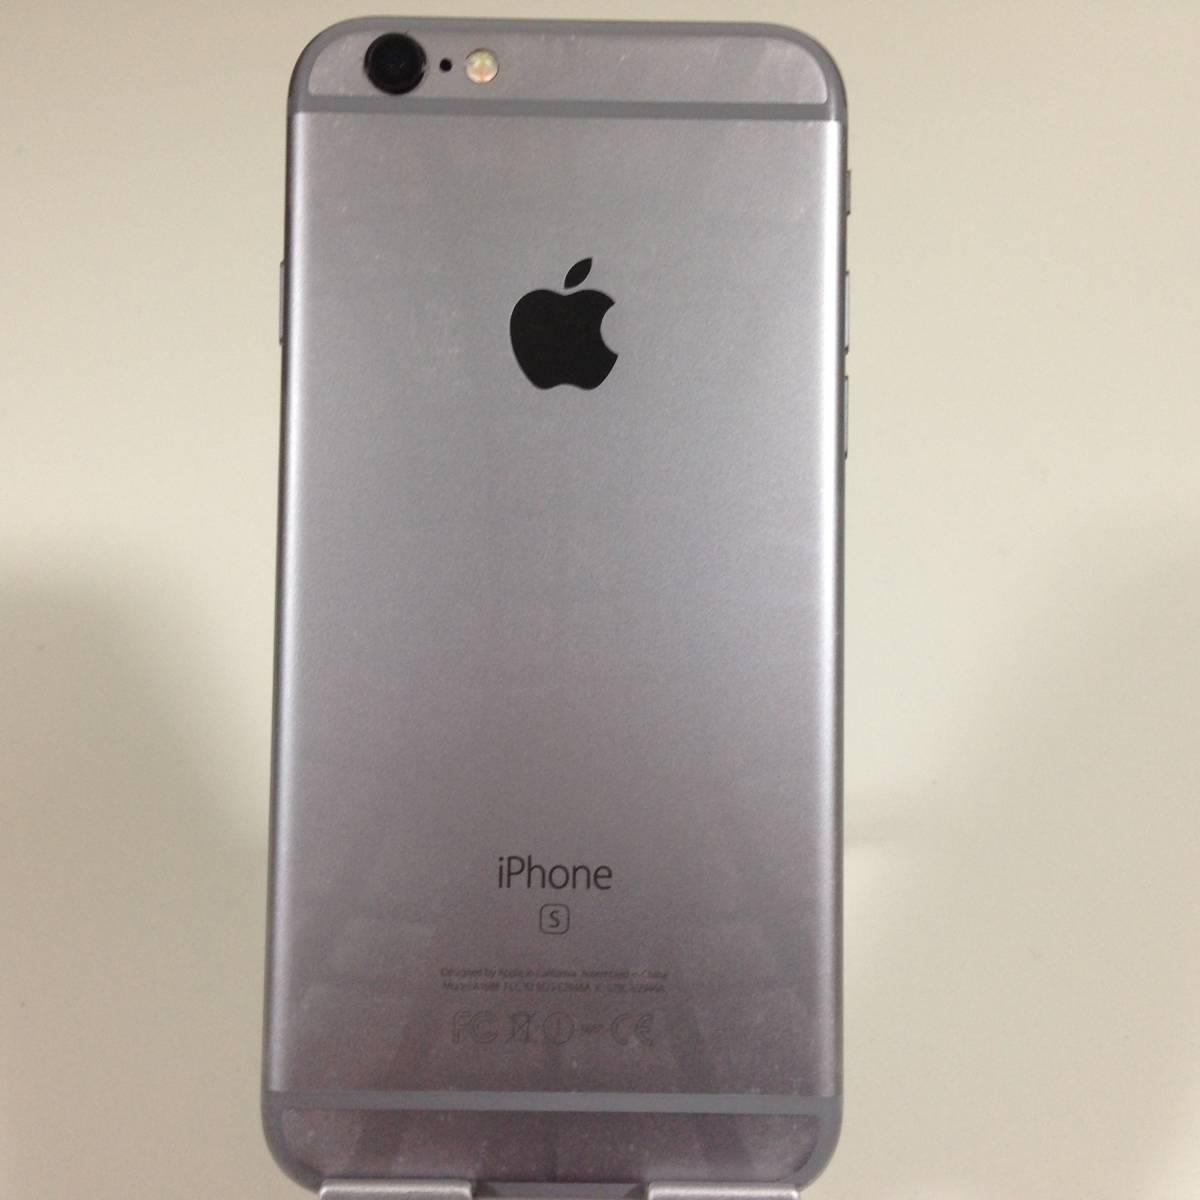 iPhone6s docomo 64GB スペースグレイ MKQN2_d1827_画像2